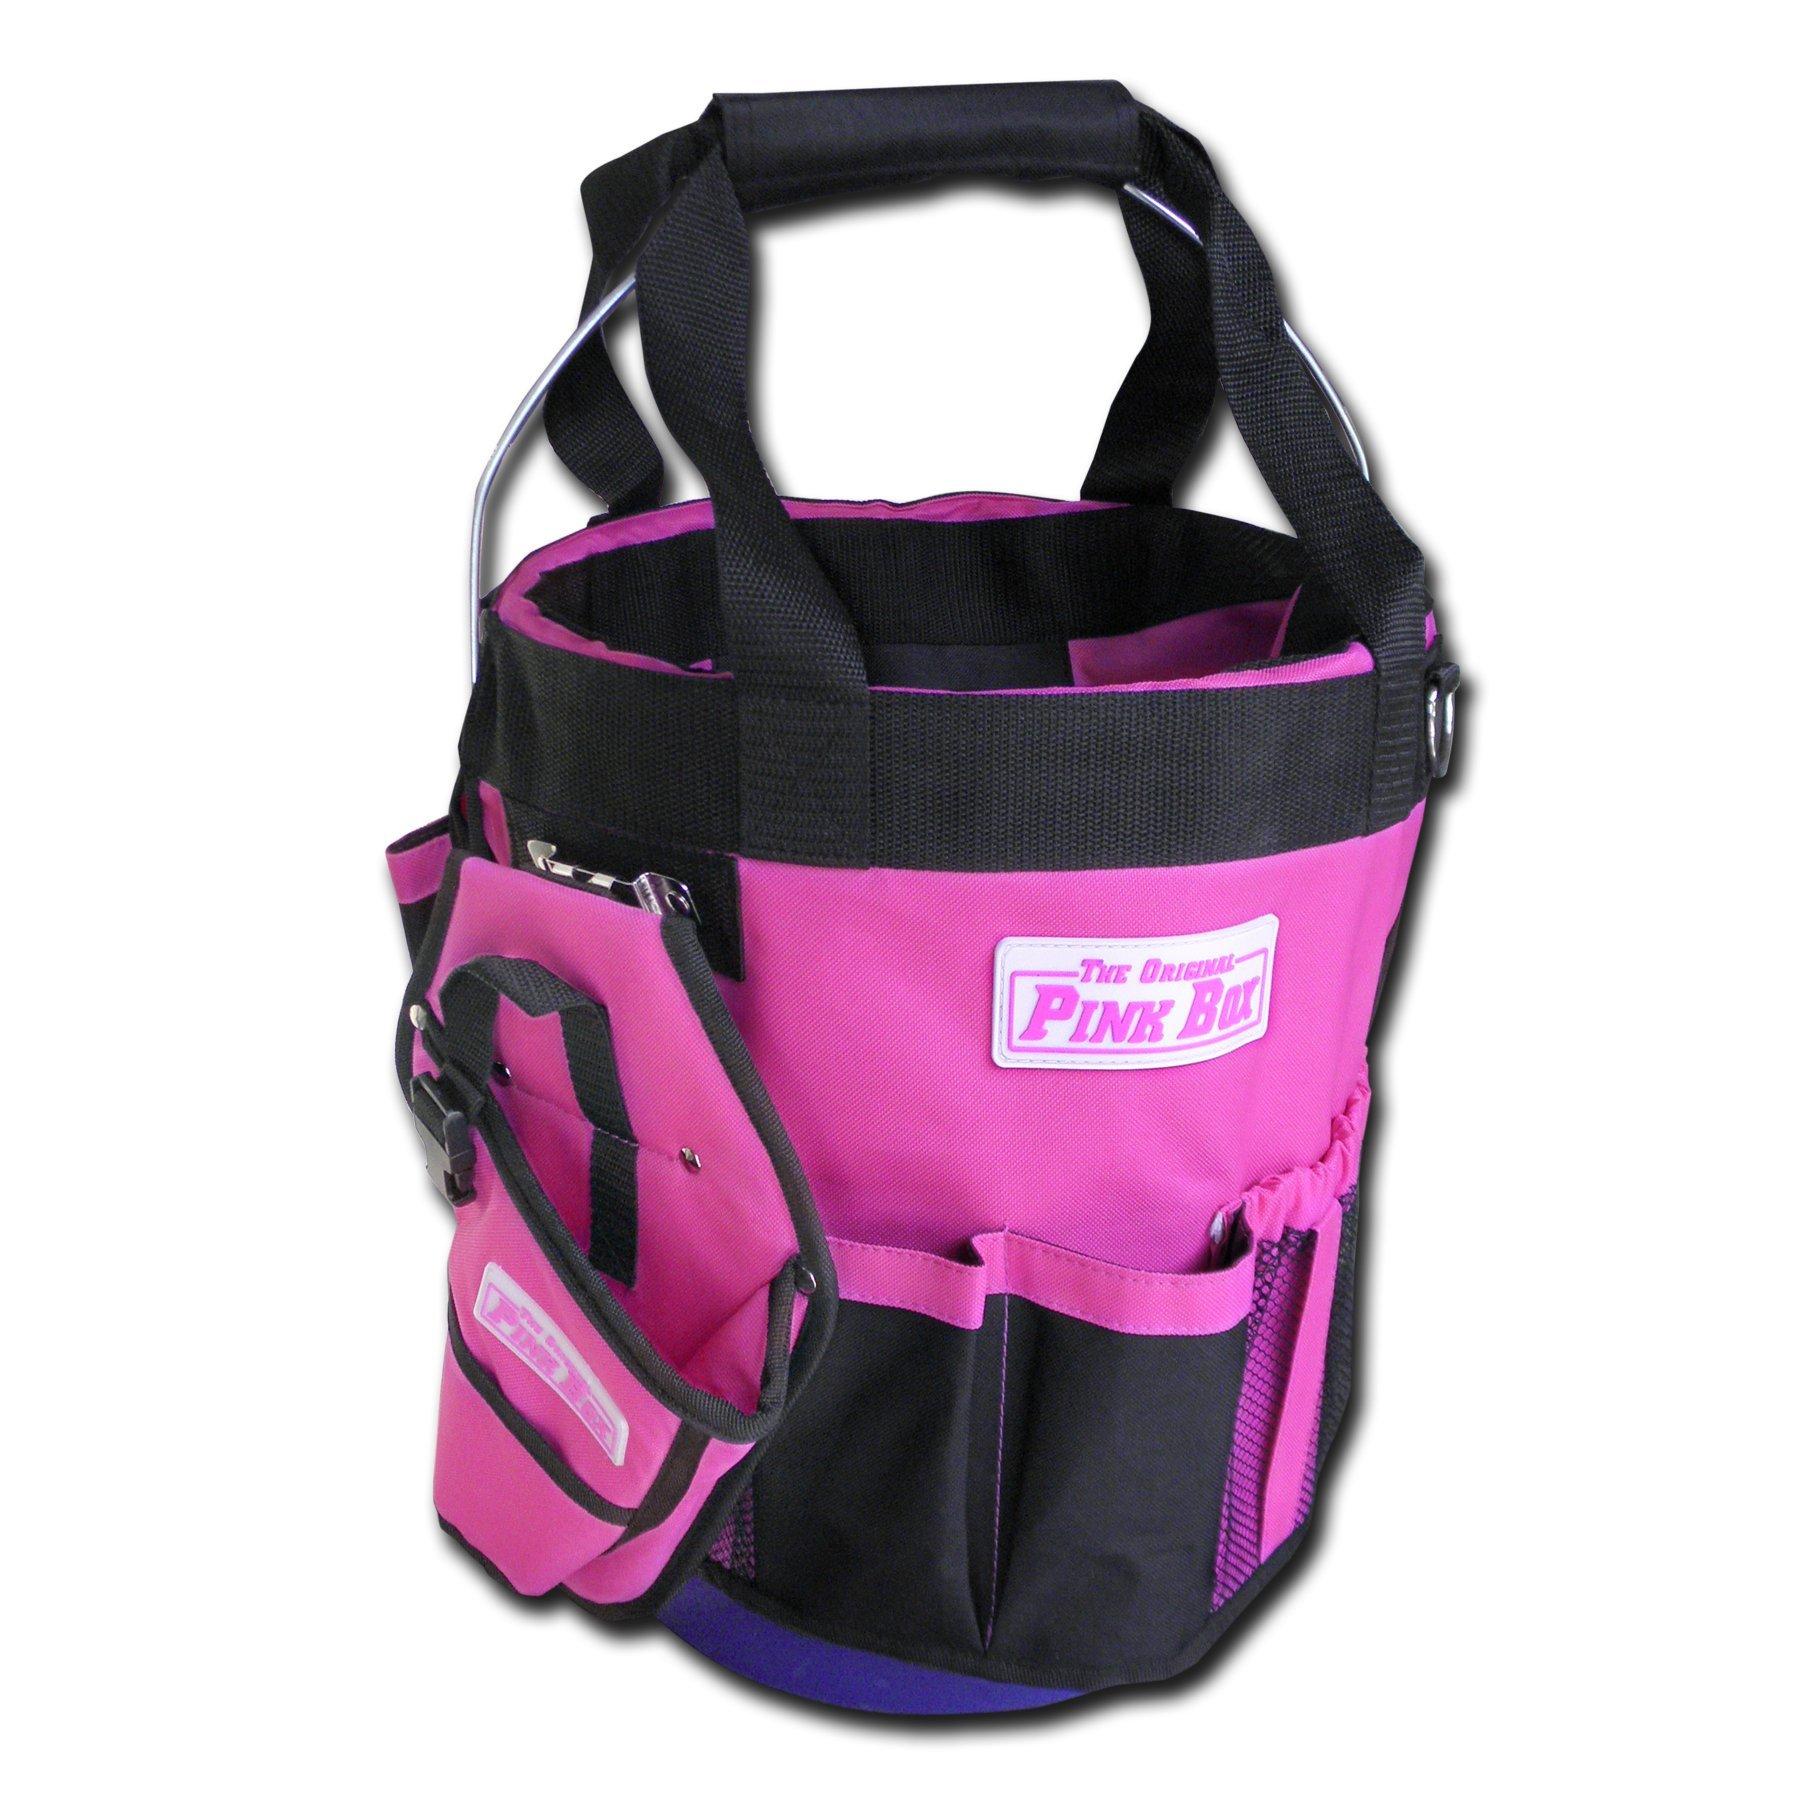 The Original Pink Box PB20BUKT 20-Pocket Bucket Caddy Tool Pouch, Pink